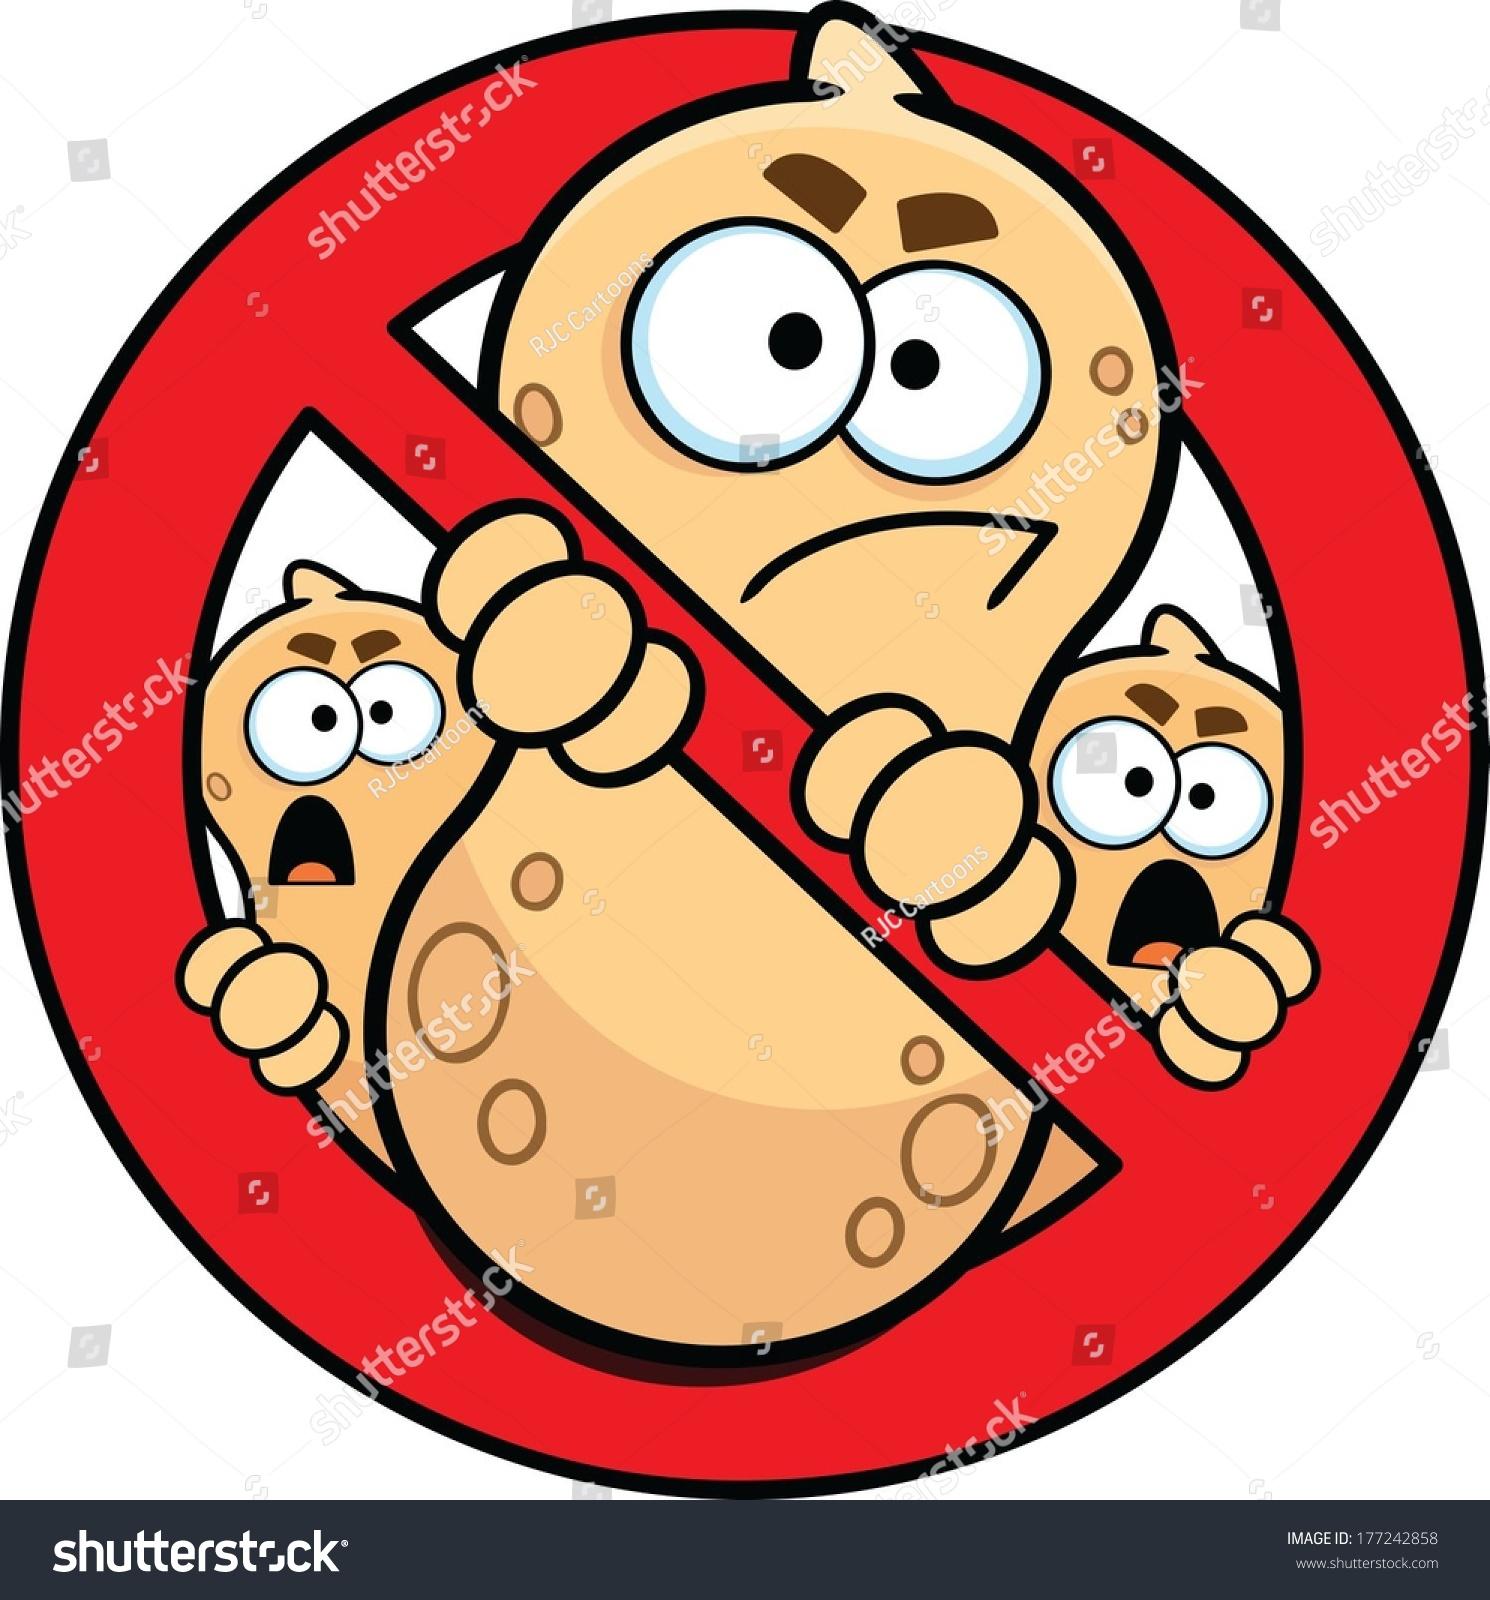 Peanuts Characters Clipart Stock Vector Allergy Alert Sign No Peanuts Done